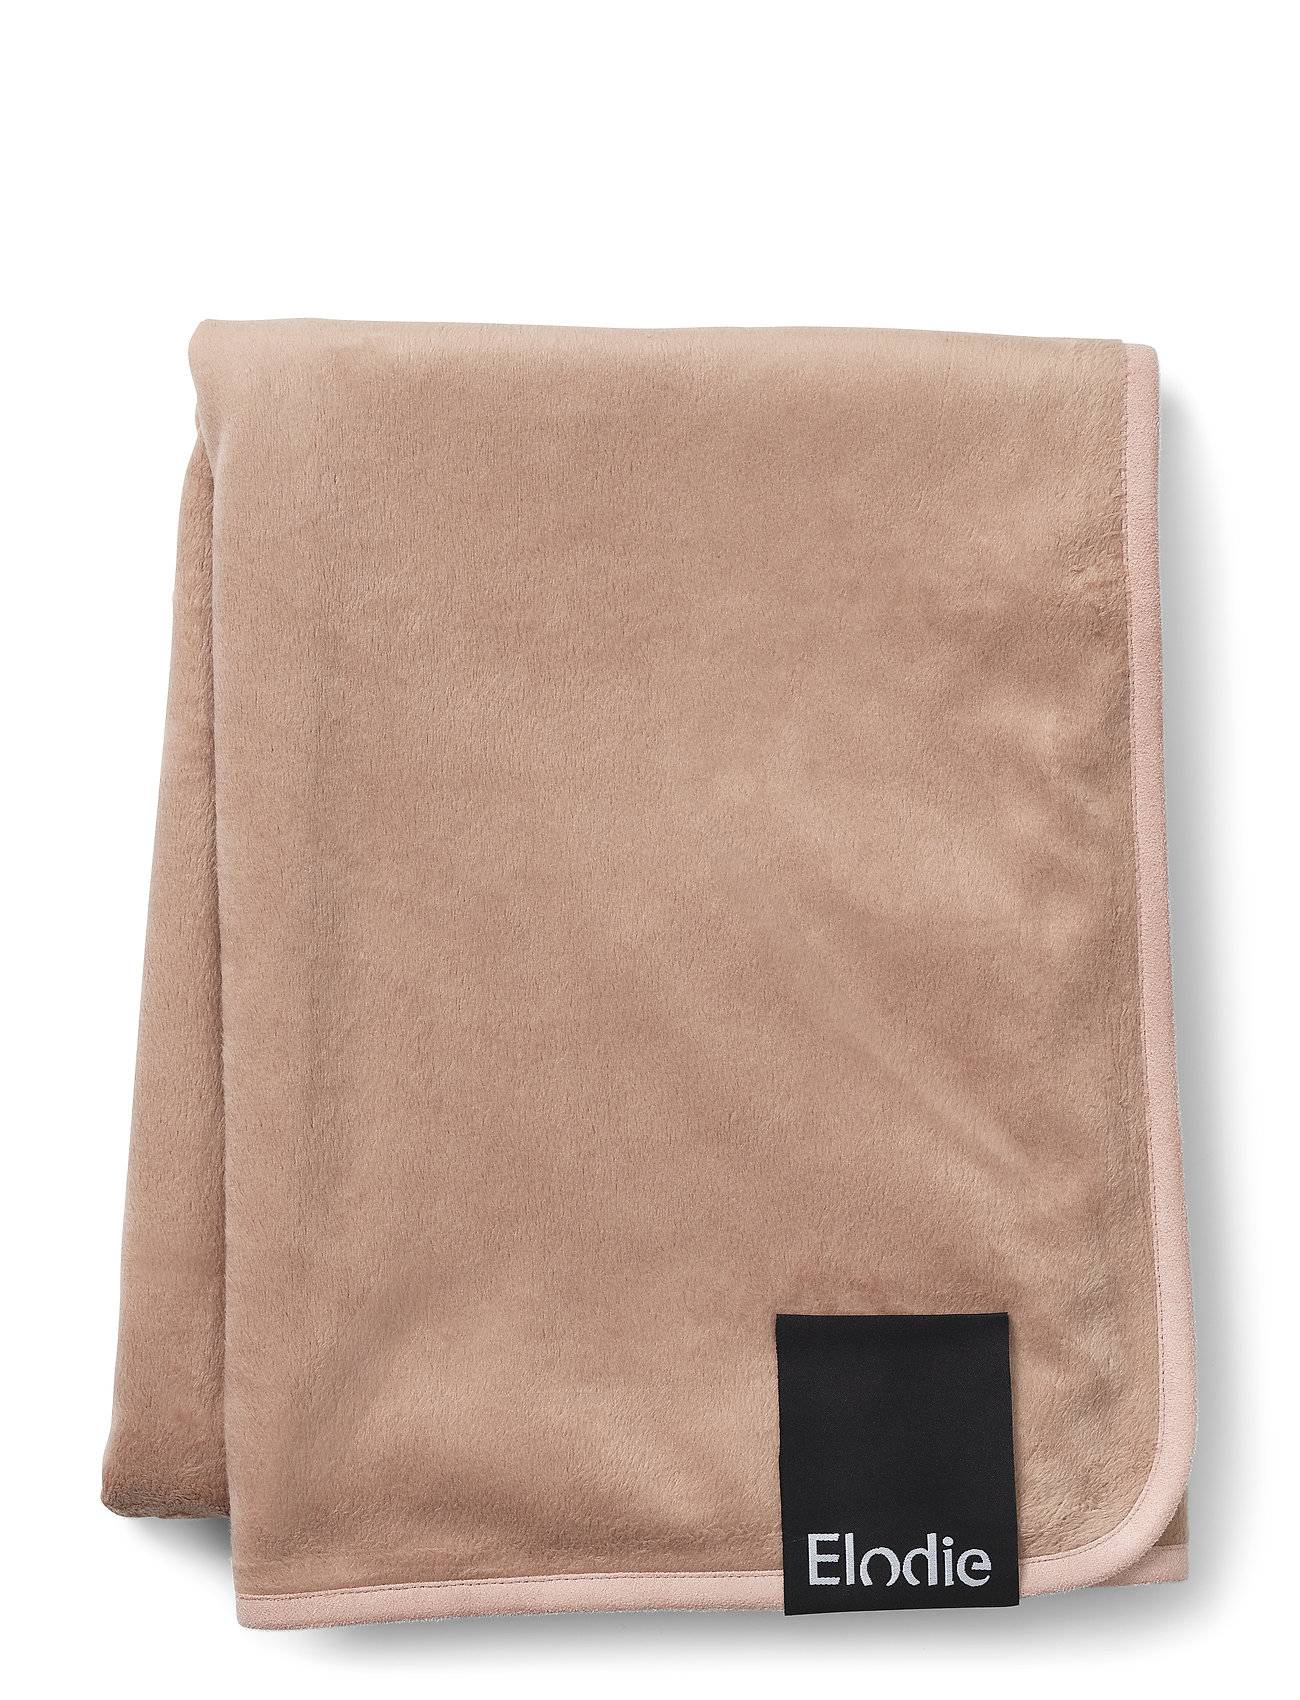 Elodie Details Pearl Velvet Blanket - Faded Rose Home Sleep Time Blankets & Quilts Vaaleanpunainen Elodie Details